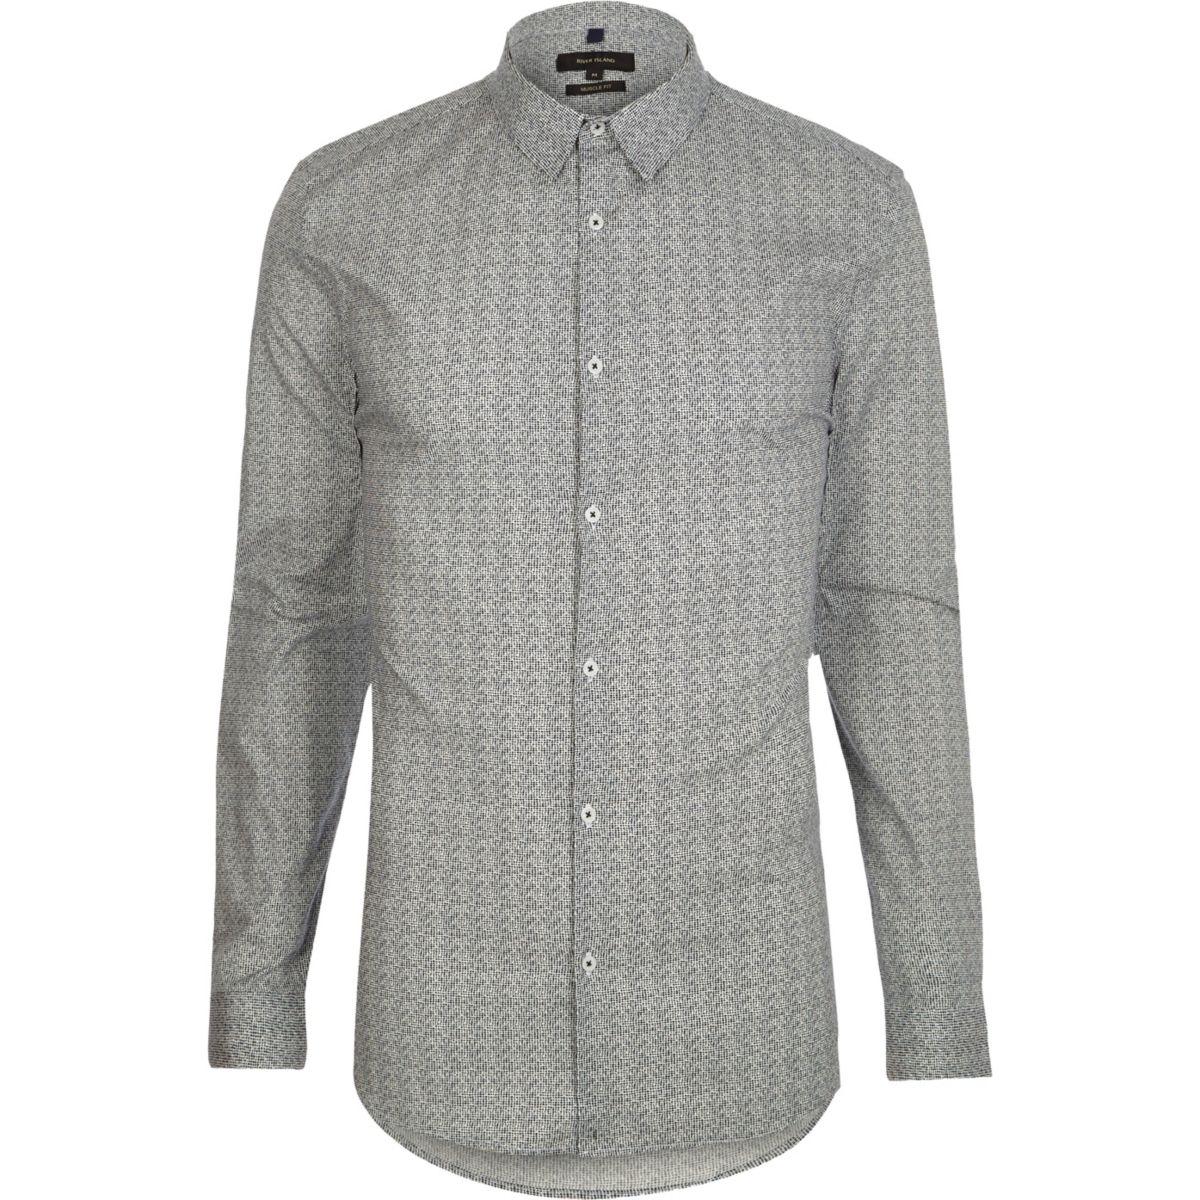 Black print long sleeve muscle fit shirt